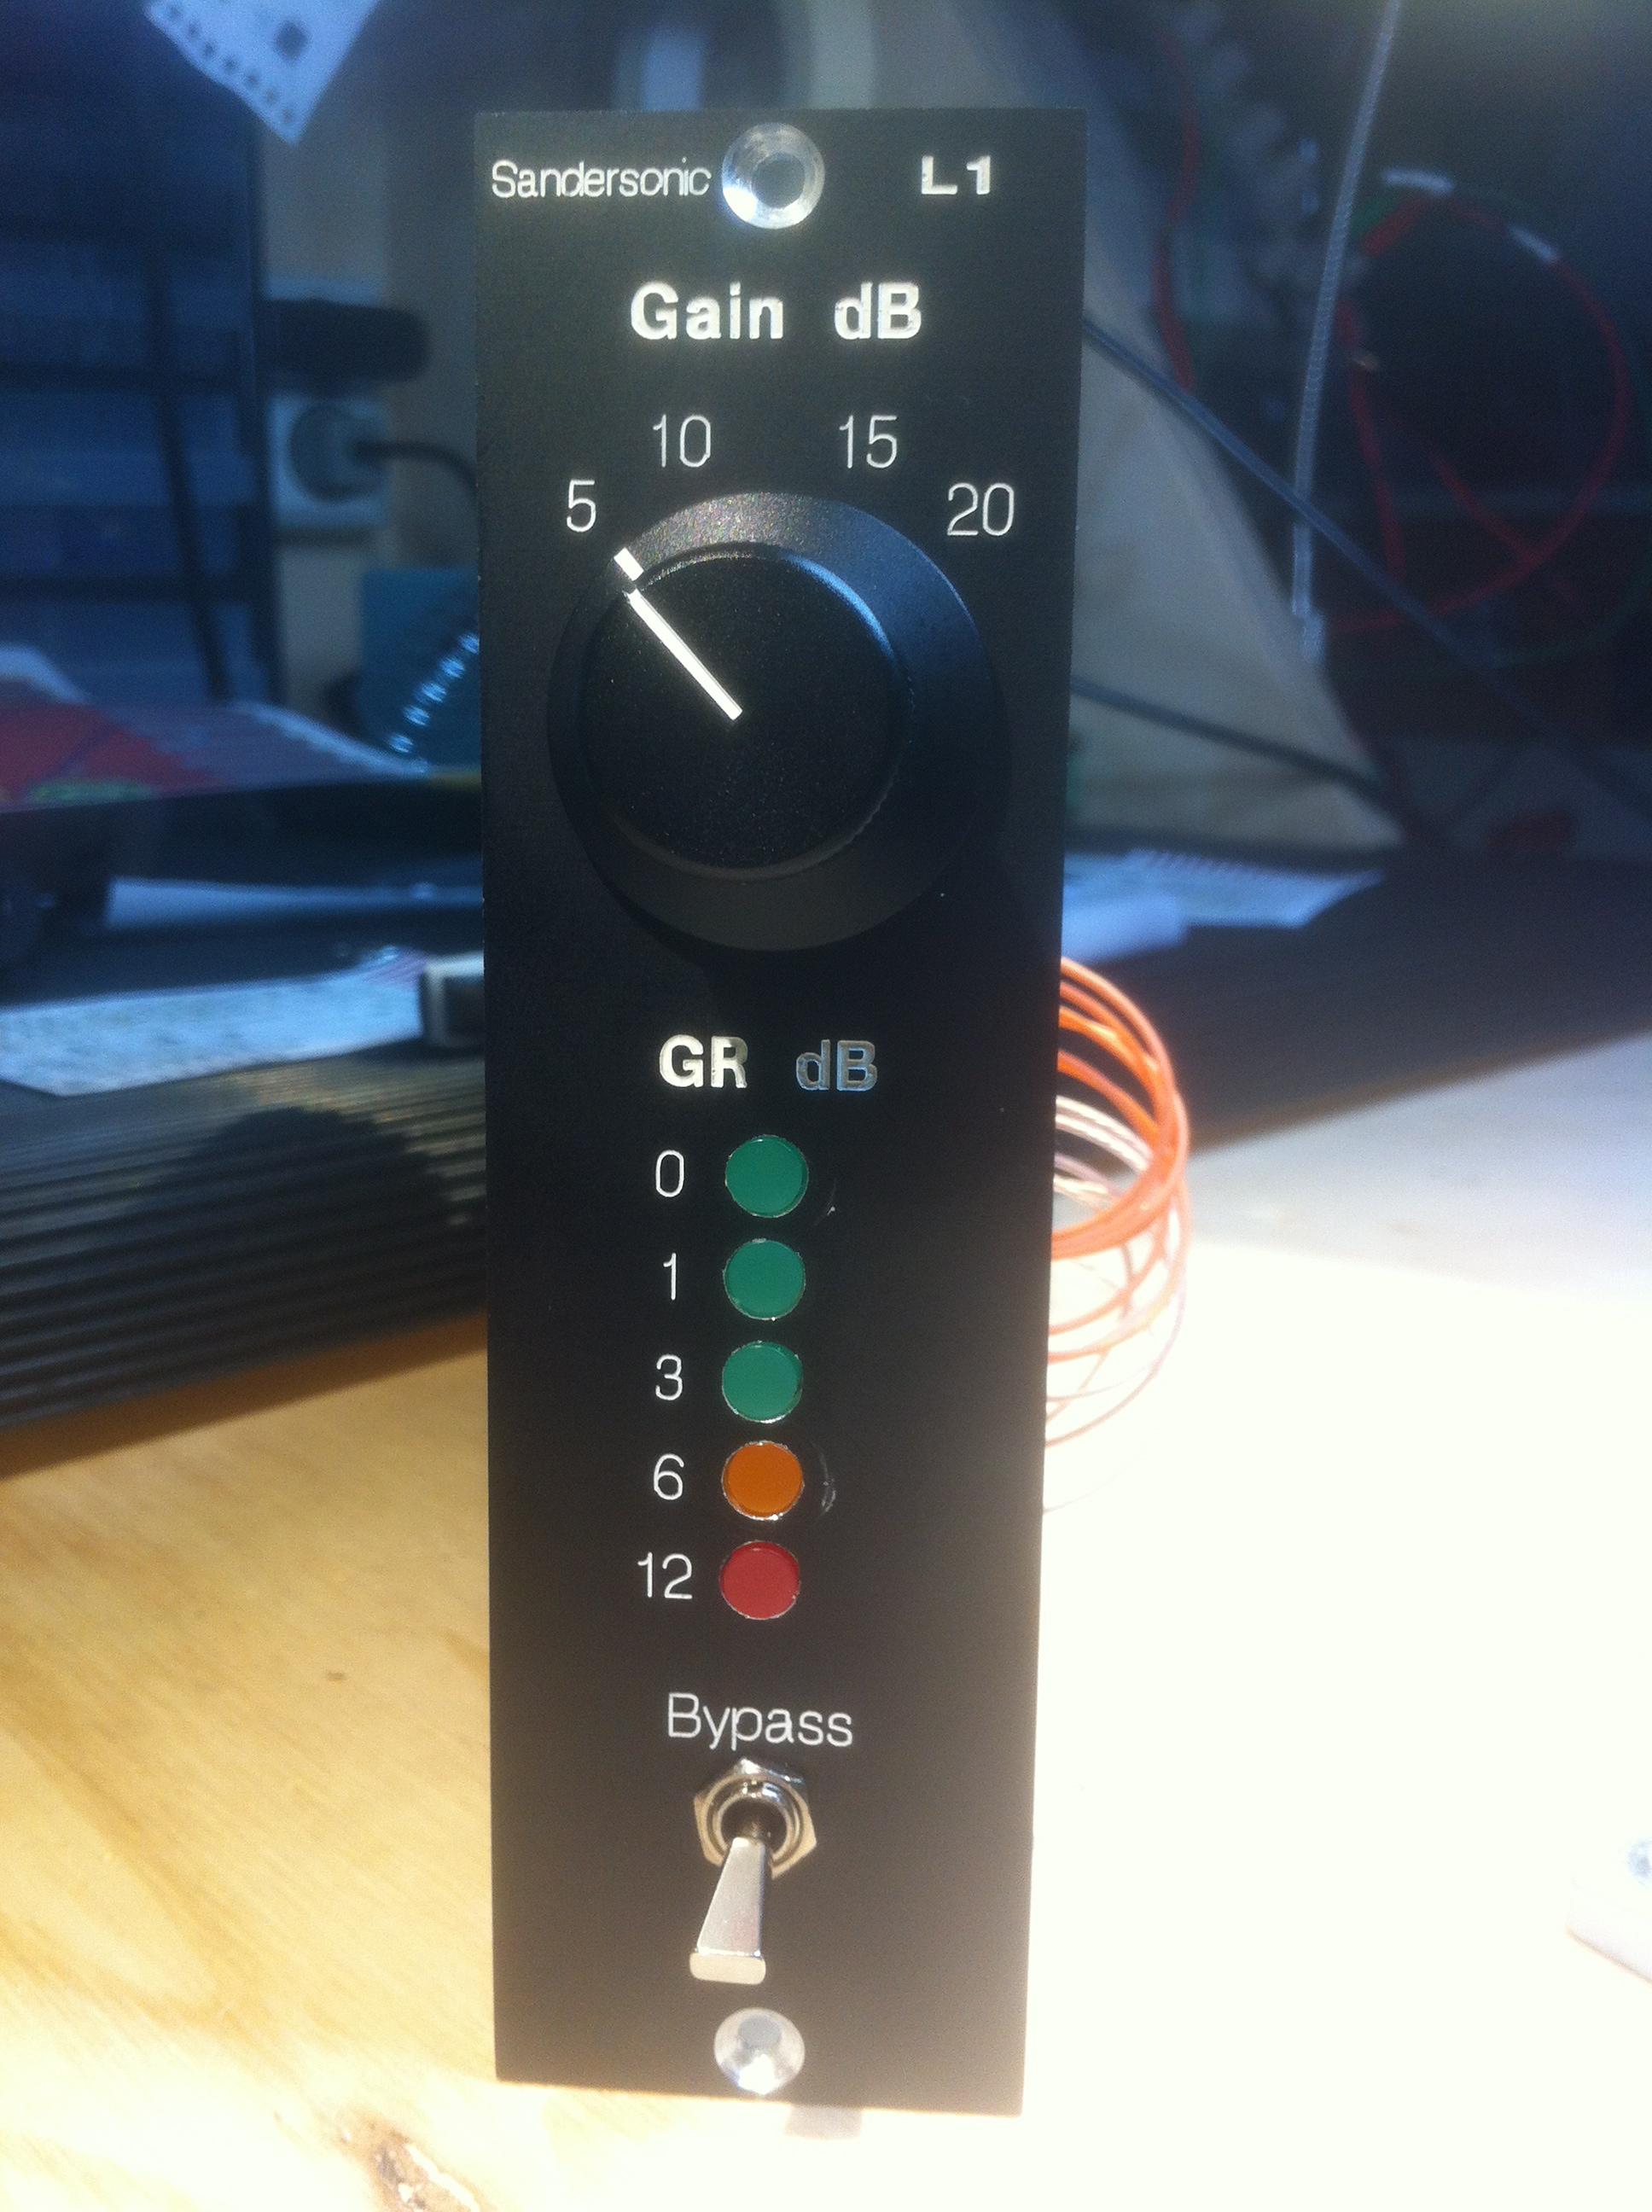 Diy 500 series units from scratch gearslutz pro audio community diy 500 series units from scratch l1frontg solutioingenieria Gallery